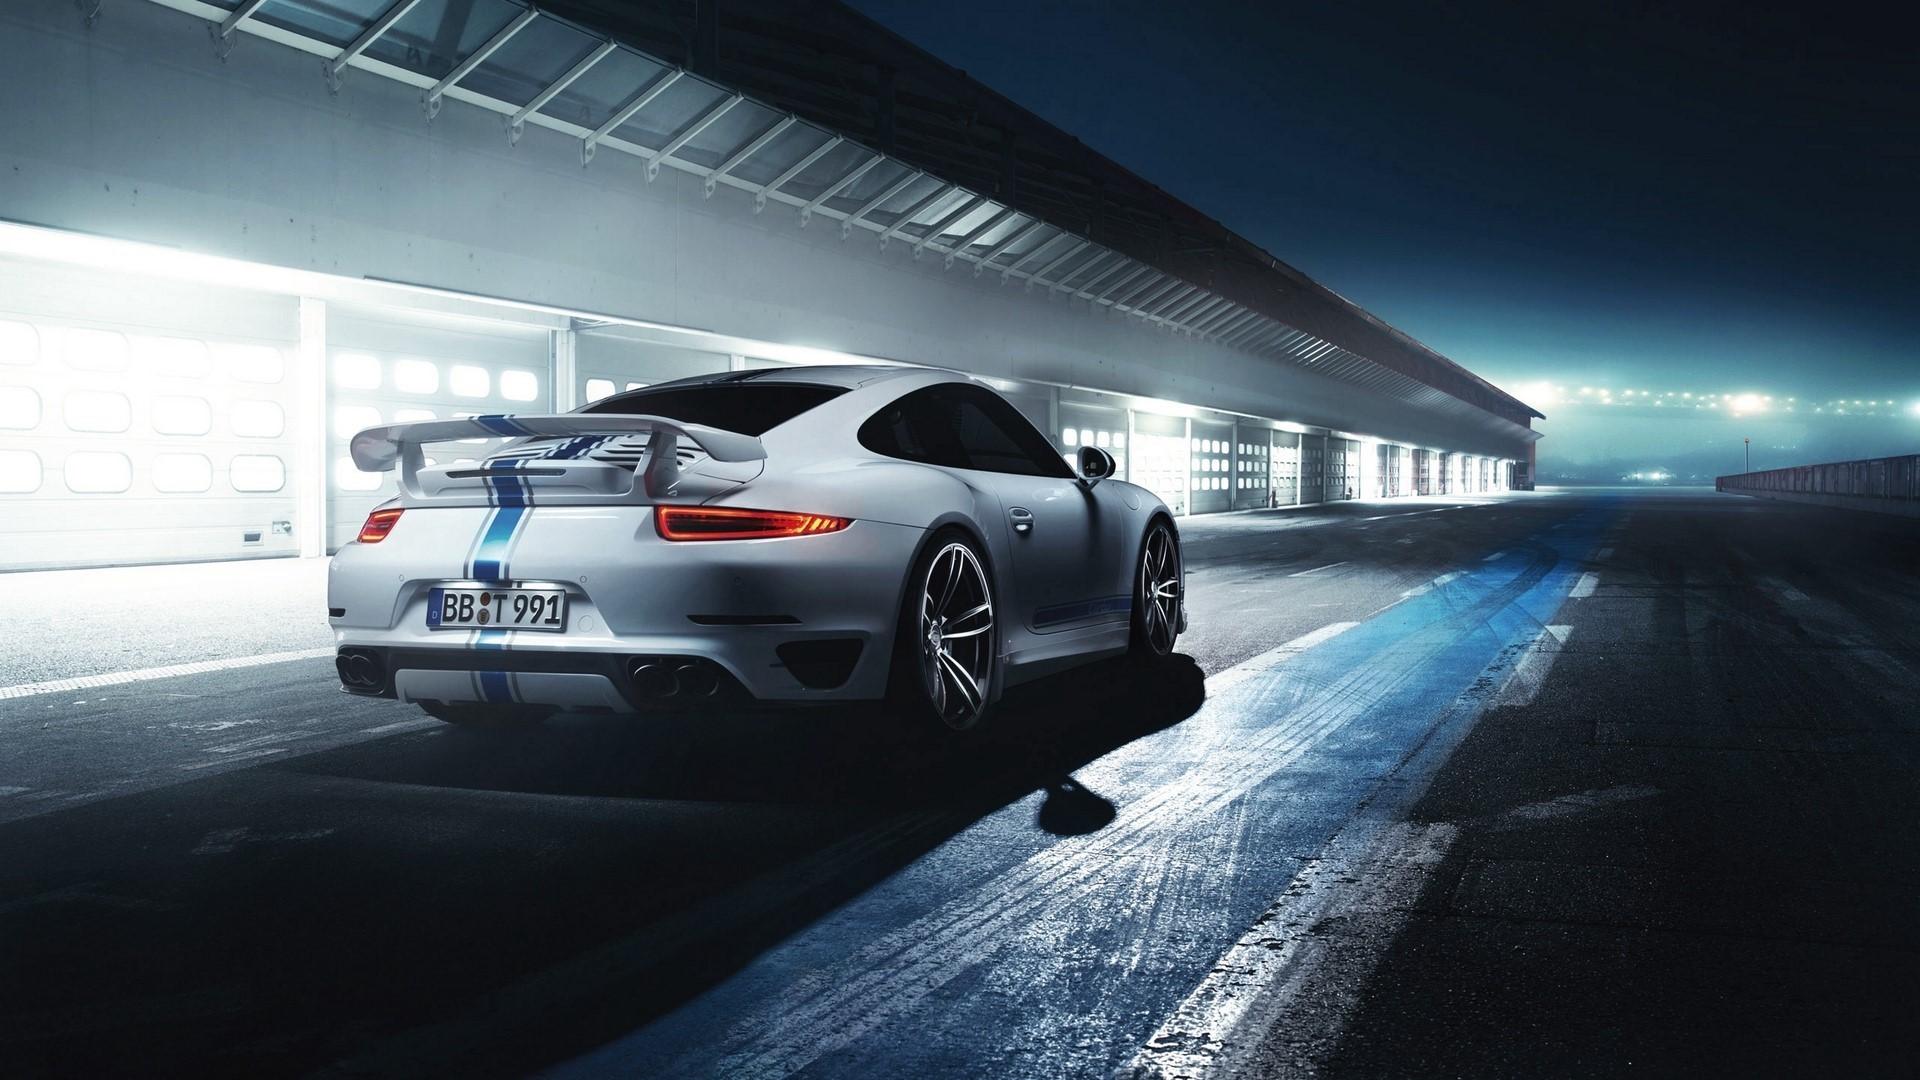 Porsche 911 Turbo Samsung Wallpapers